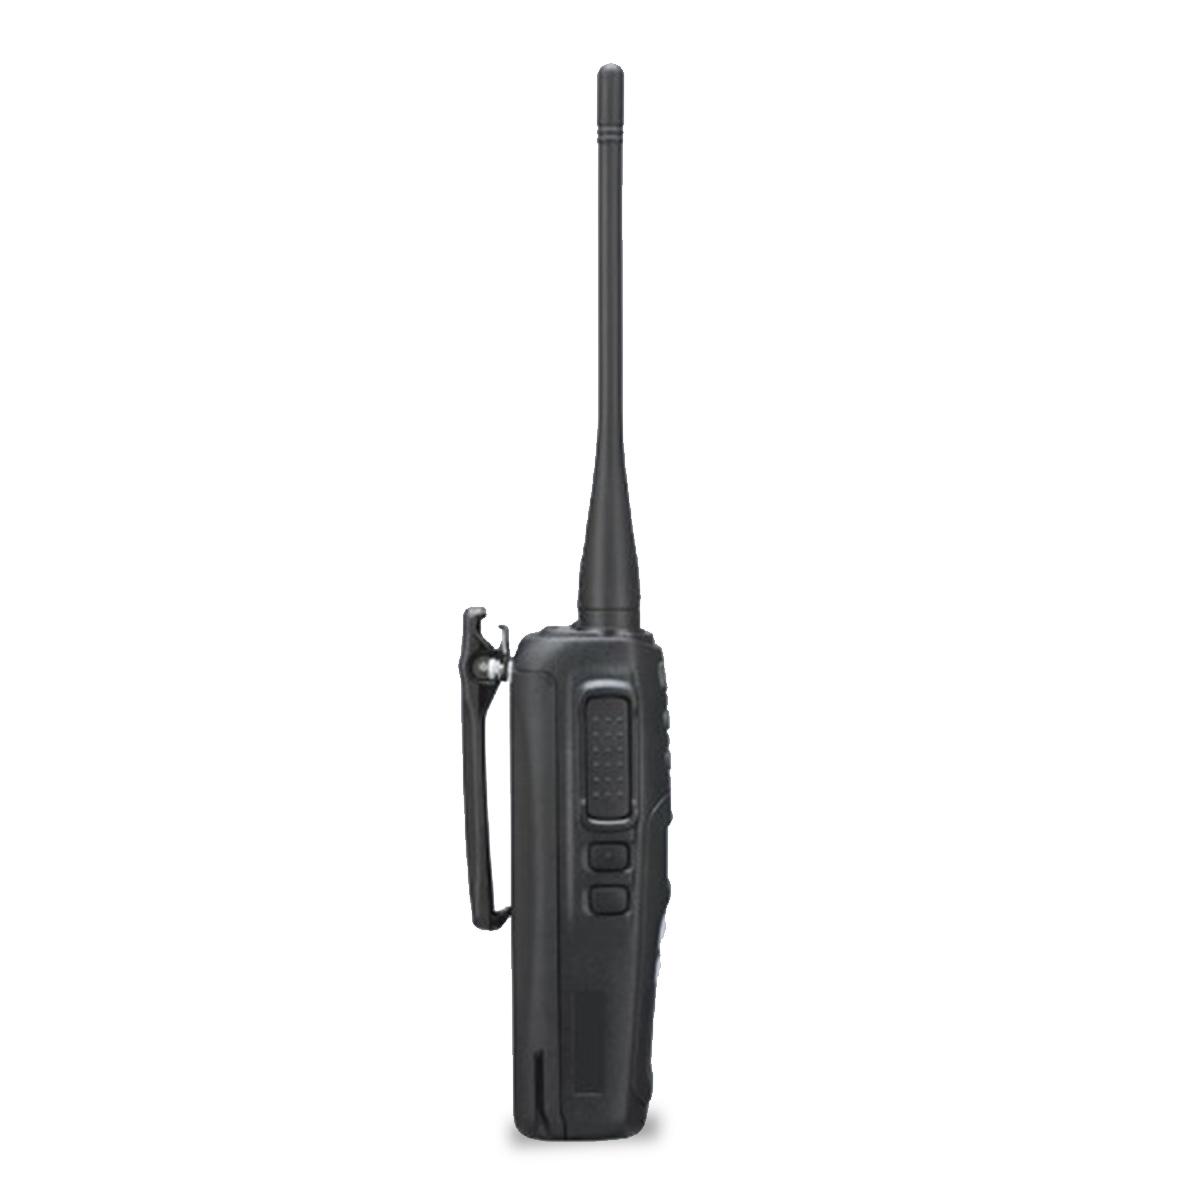 Radio KENWOOD NX-1200/NX-1300 Digital